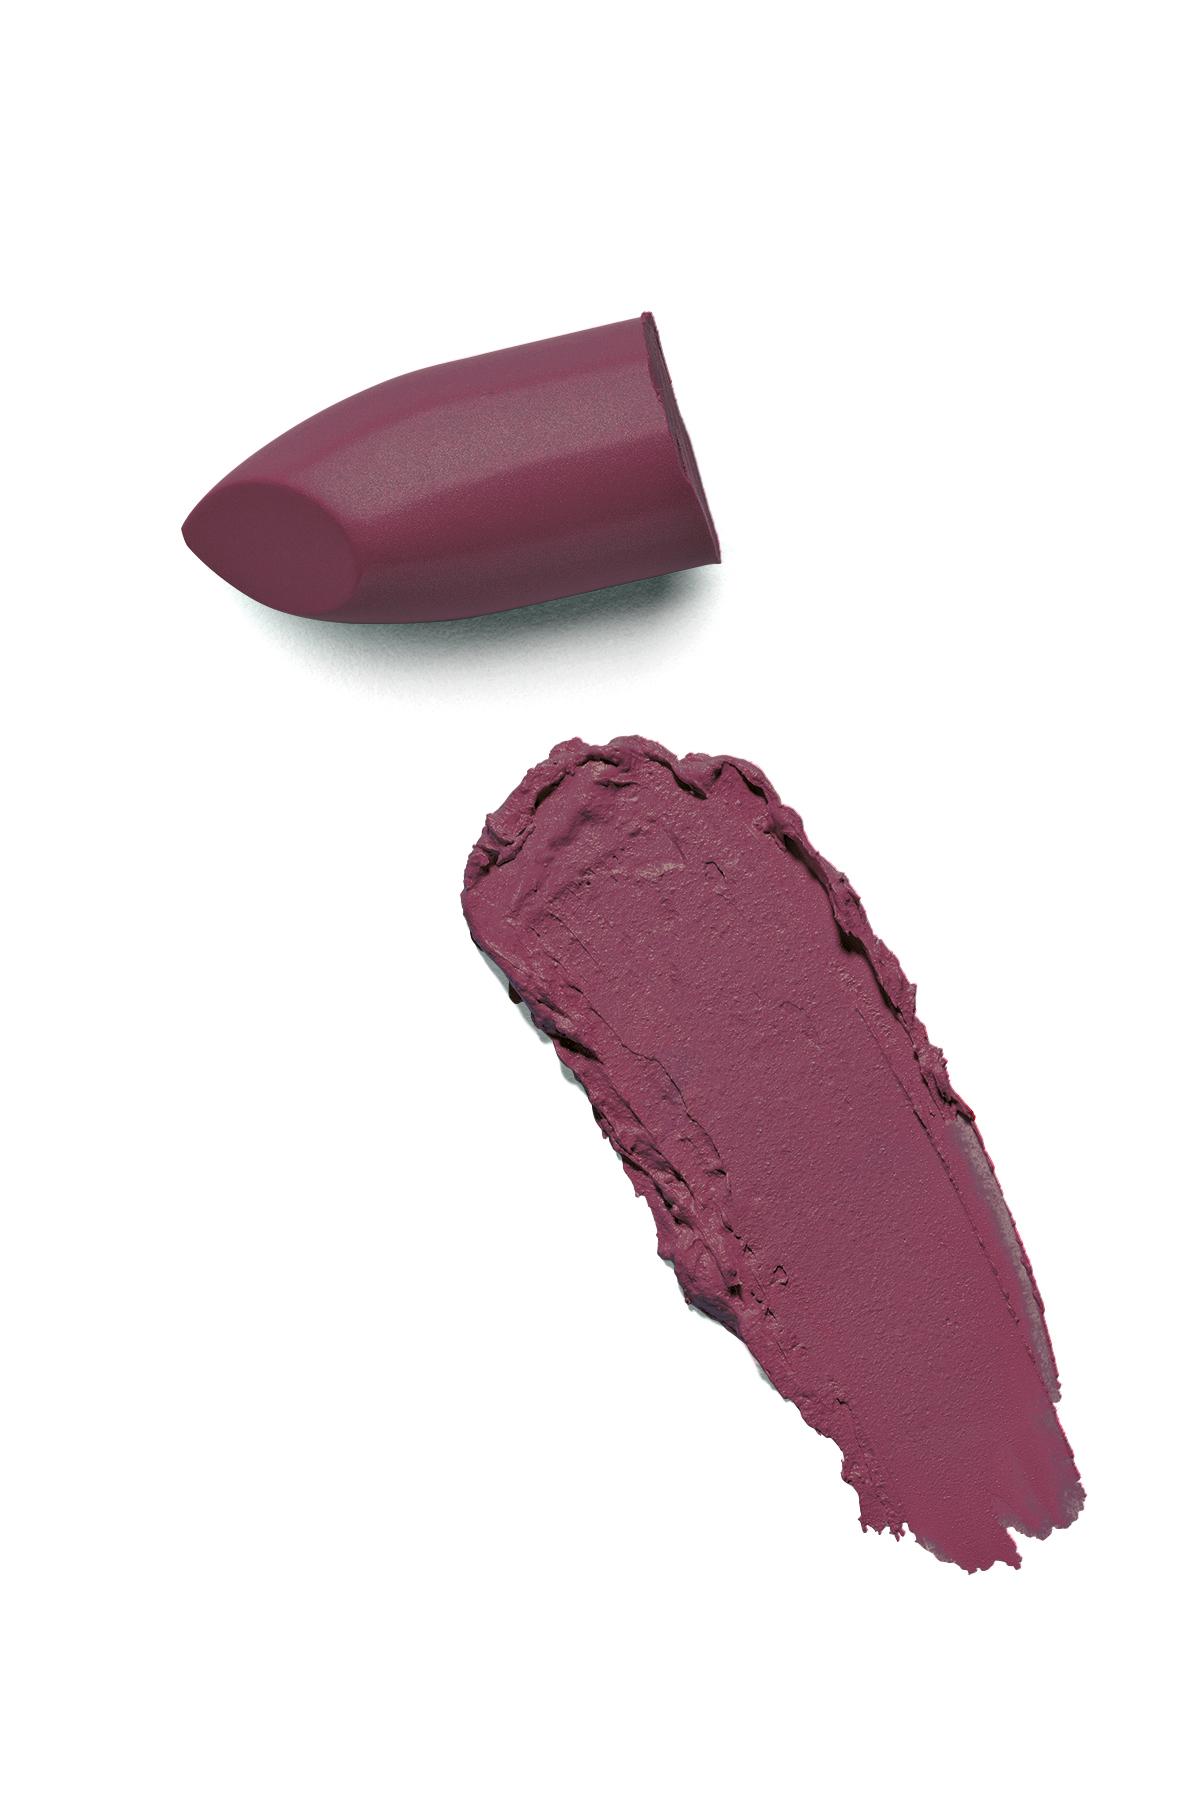 Matte Lipstick - 177 -Lipstick Thumbnail